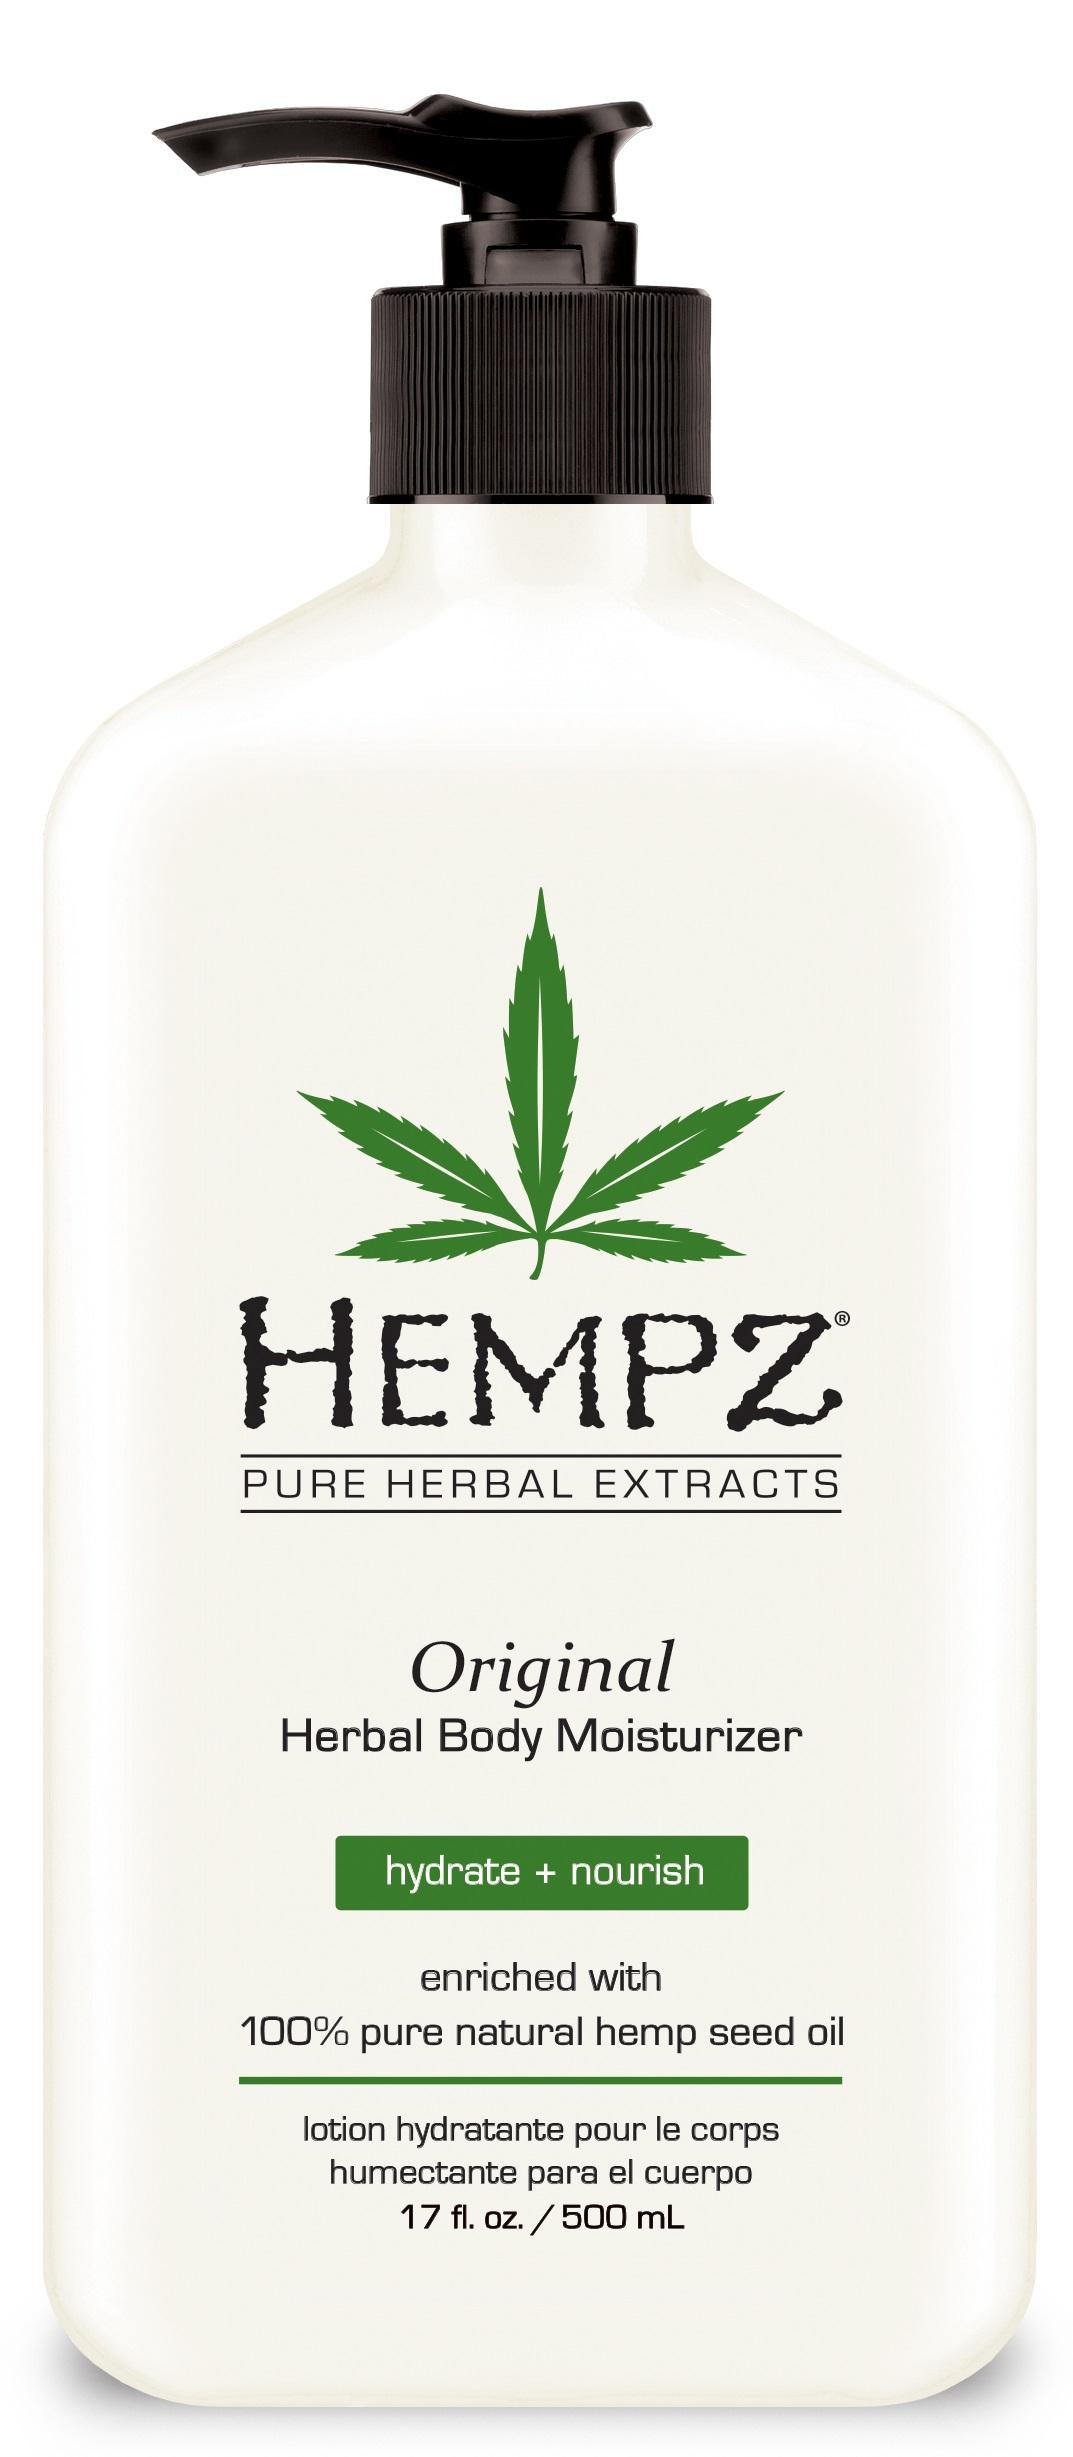 Image of Hempz Original Herbal Body Moisturizer 500ml